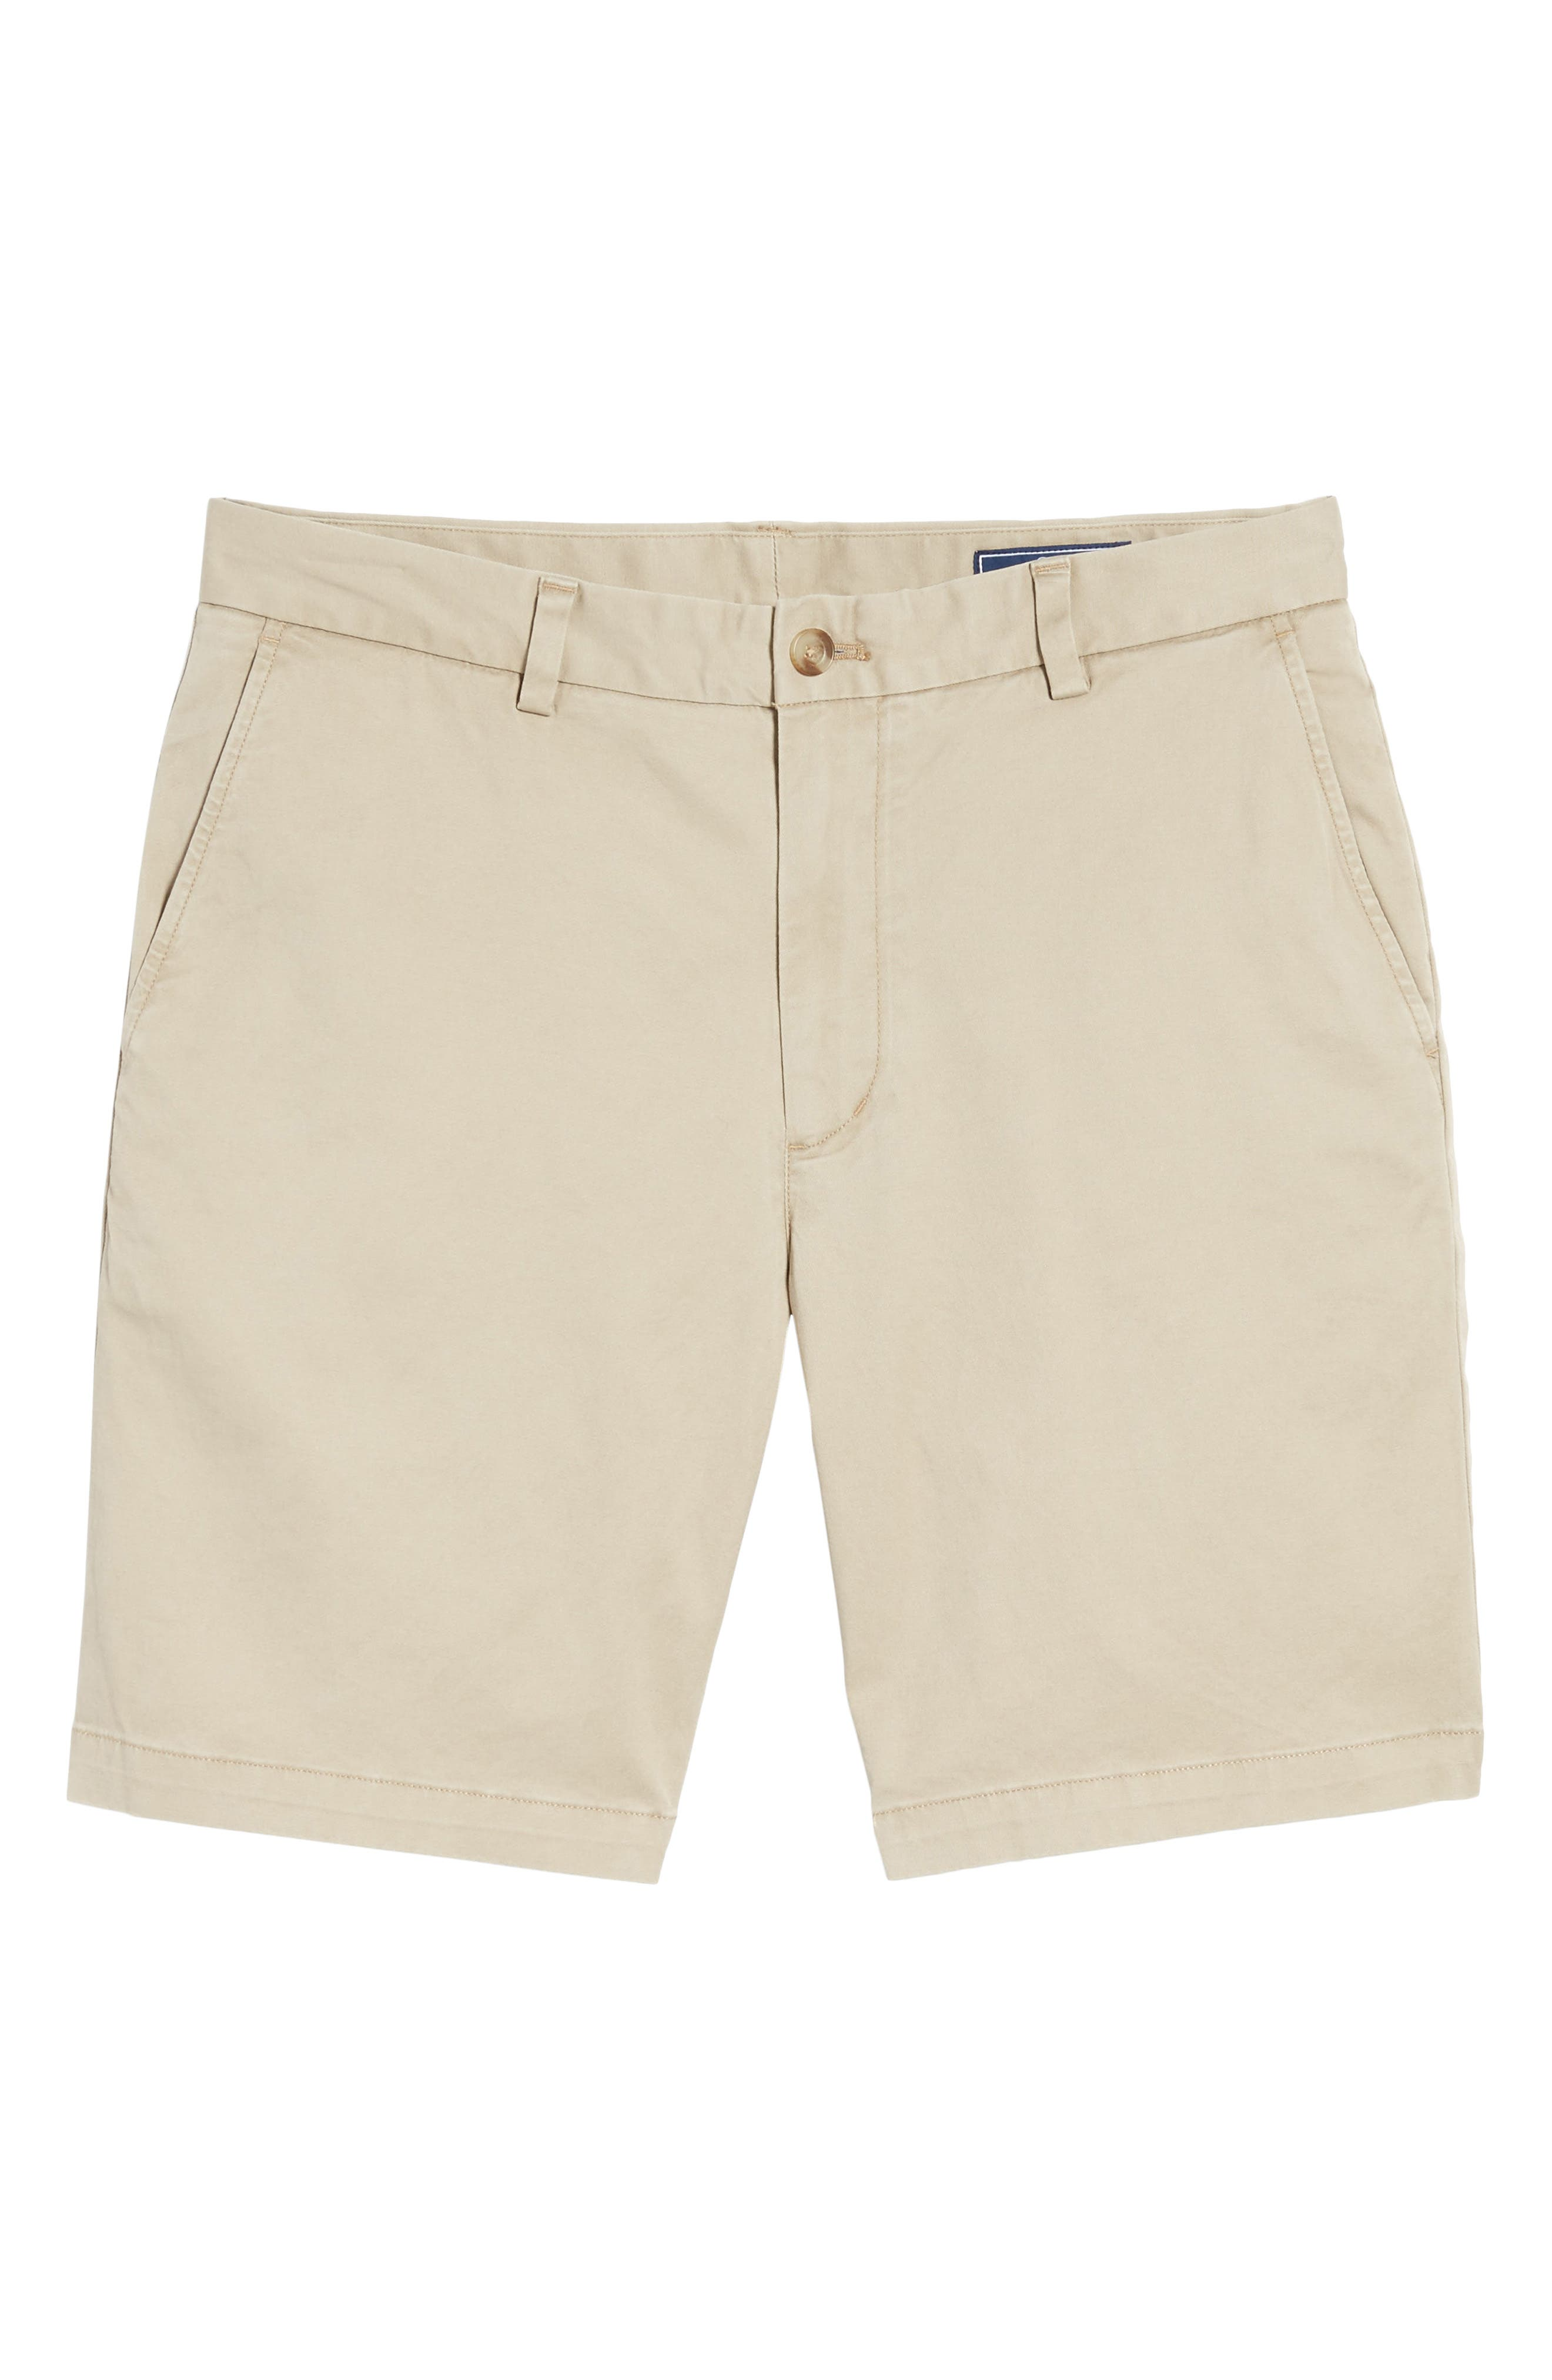 9 Inch Stretch Breaker Shorts,                             Alternate thumbnail 6, color,                             Khaki